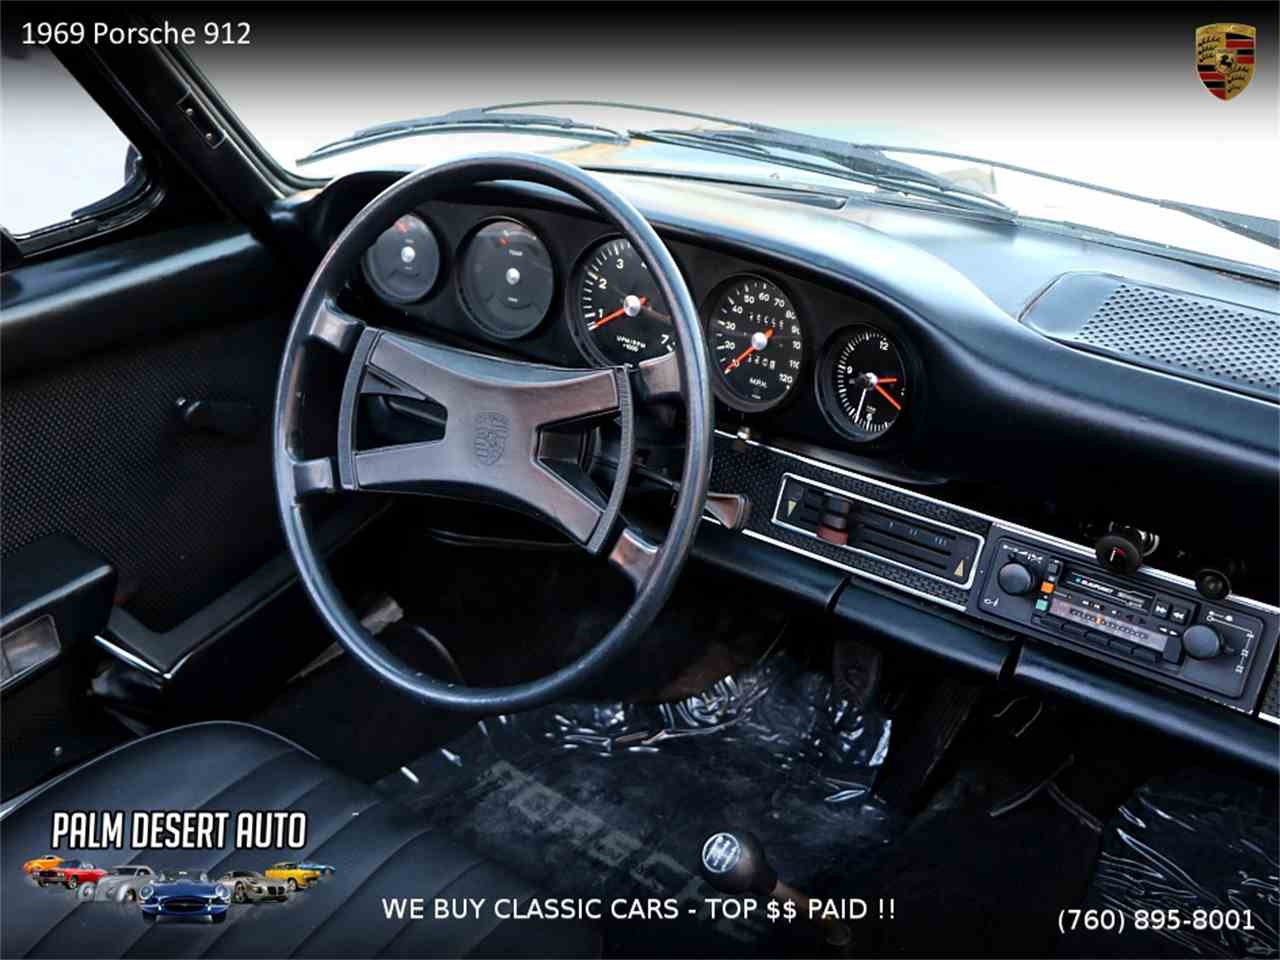 1969 Porsche 912 for Sale | ClassicCars.com | CC-1076018